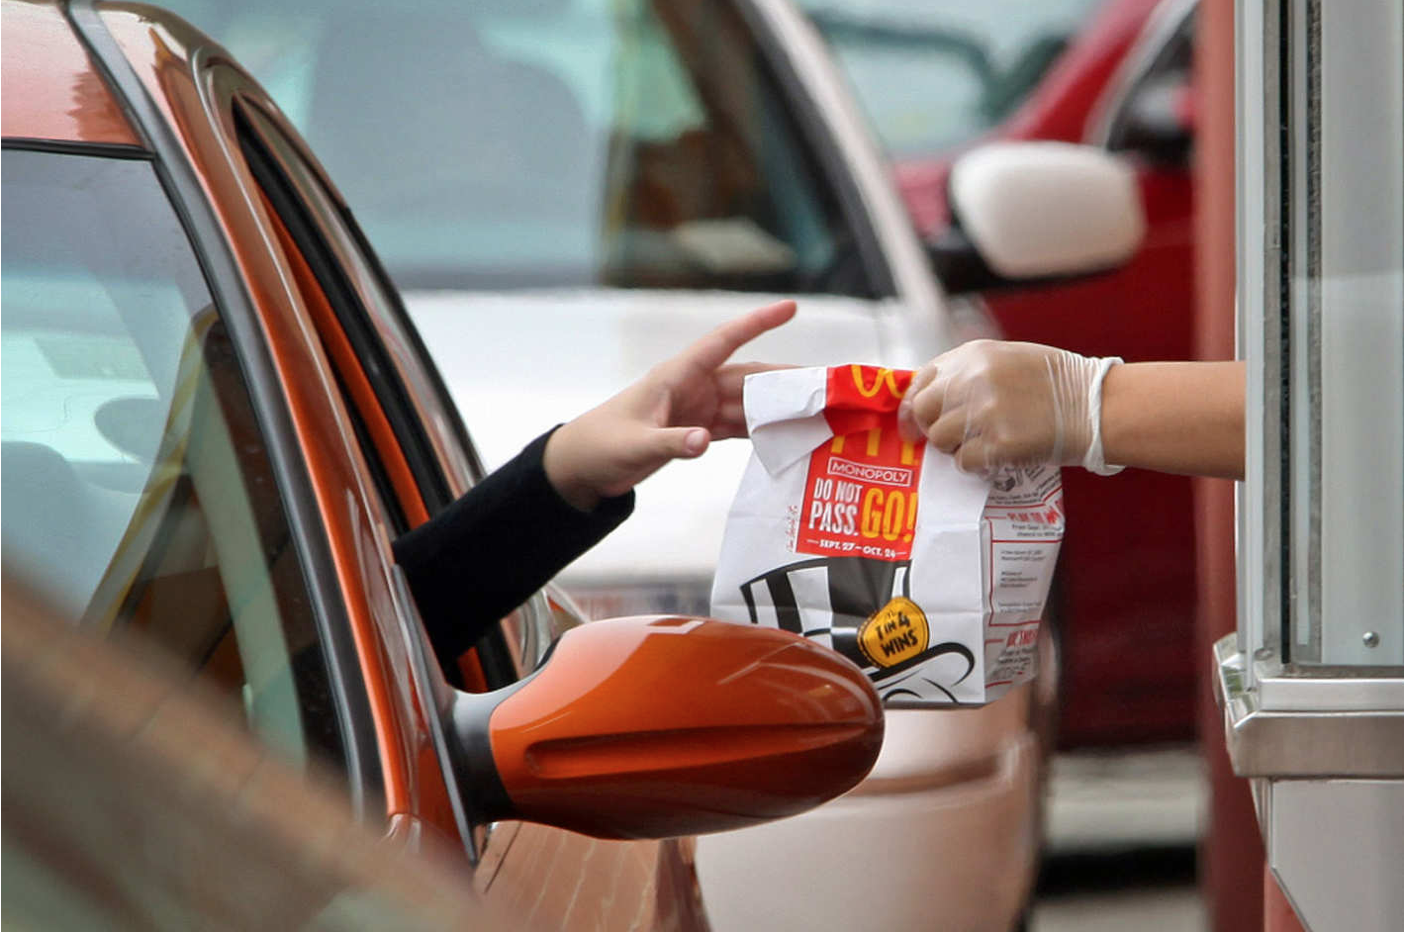 Top 10 McDonalds Secrets – Drive-Thru